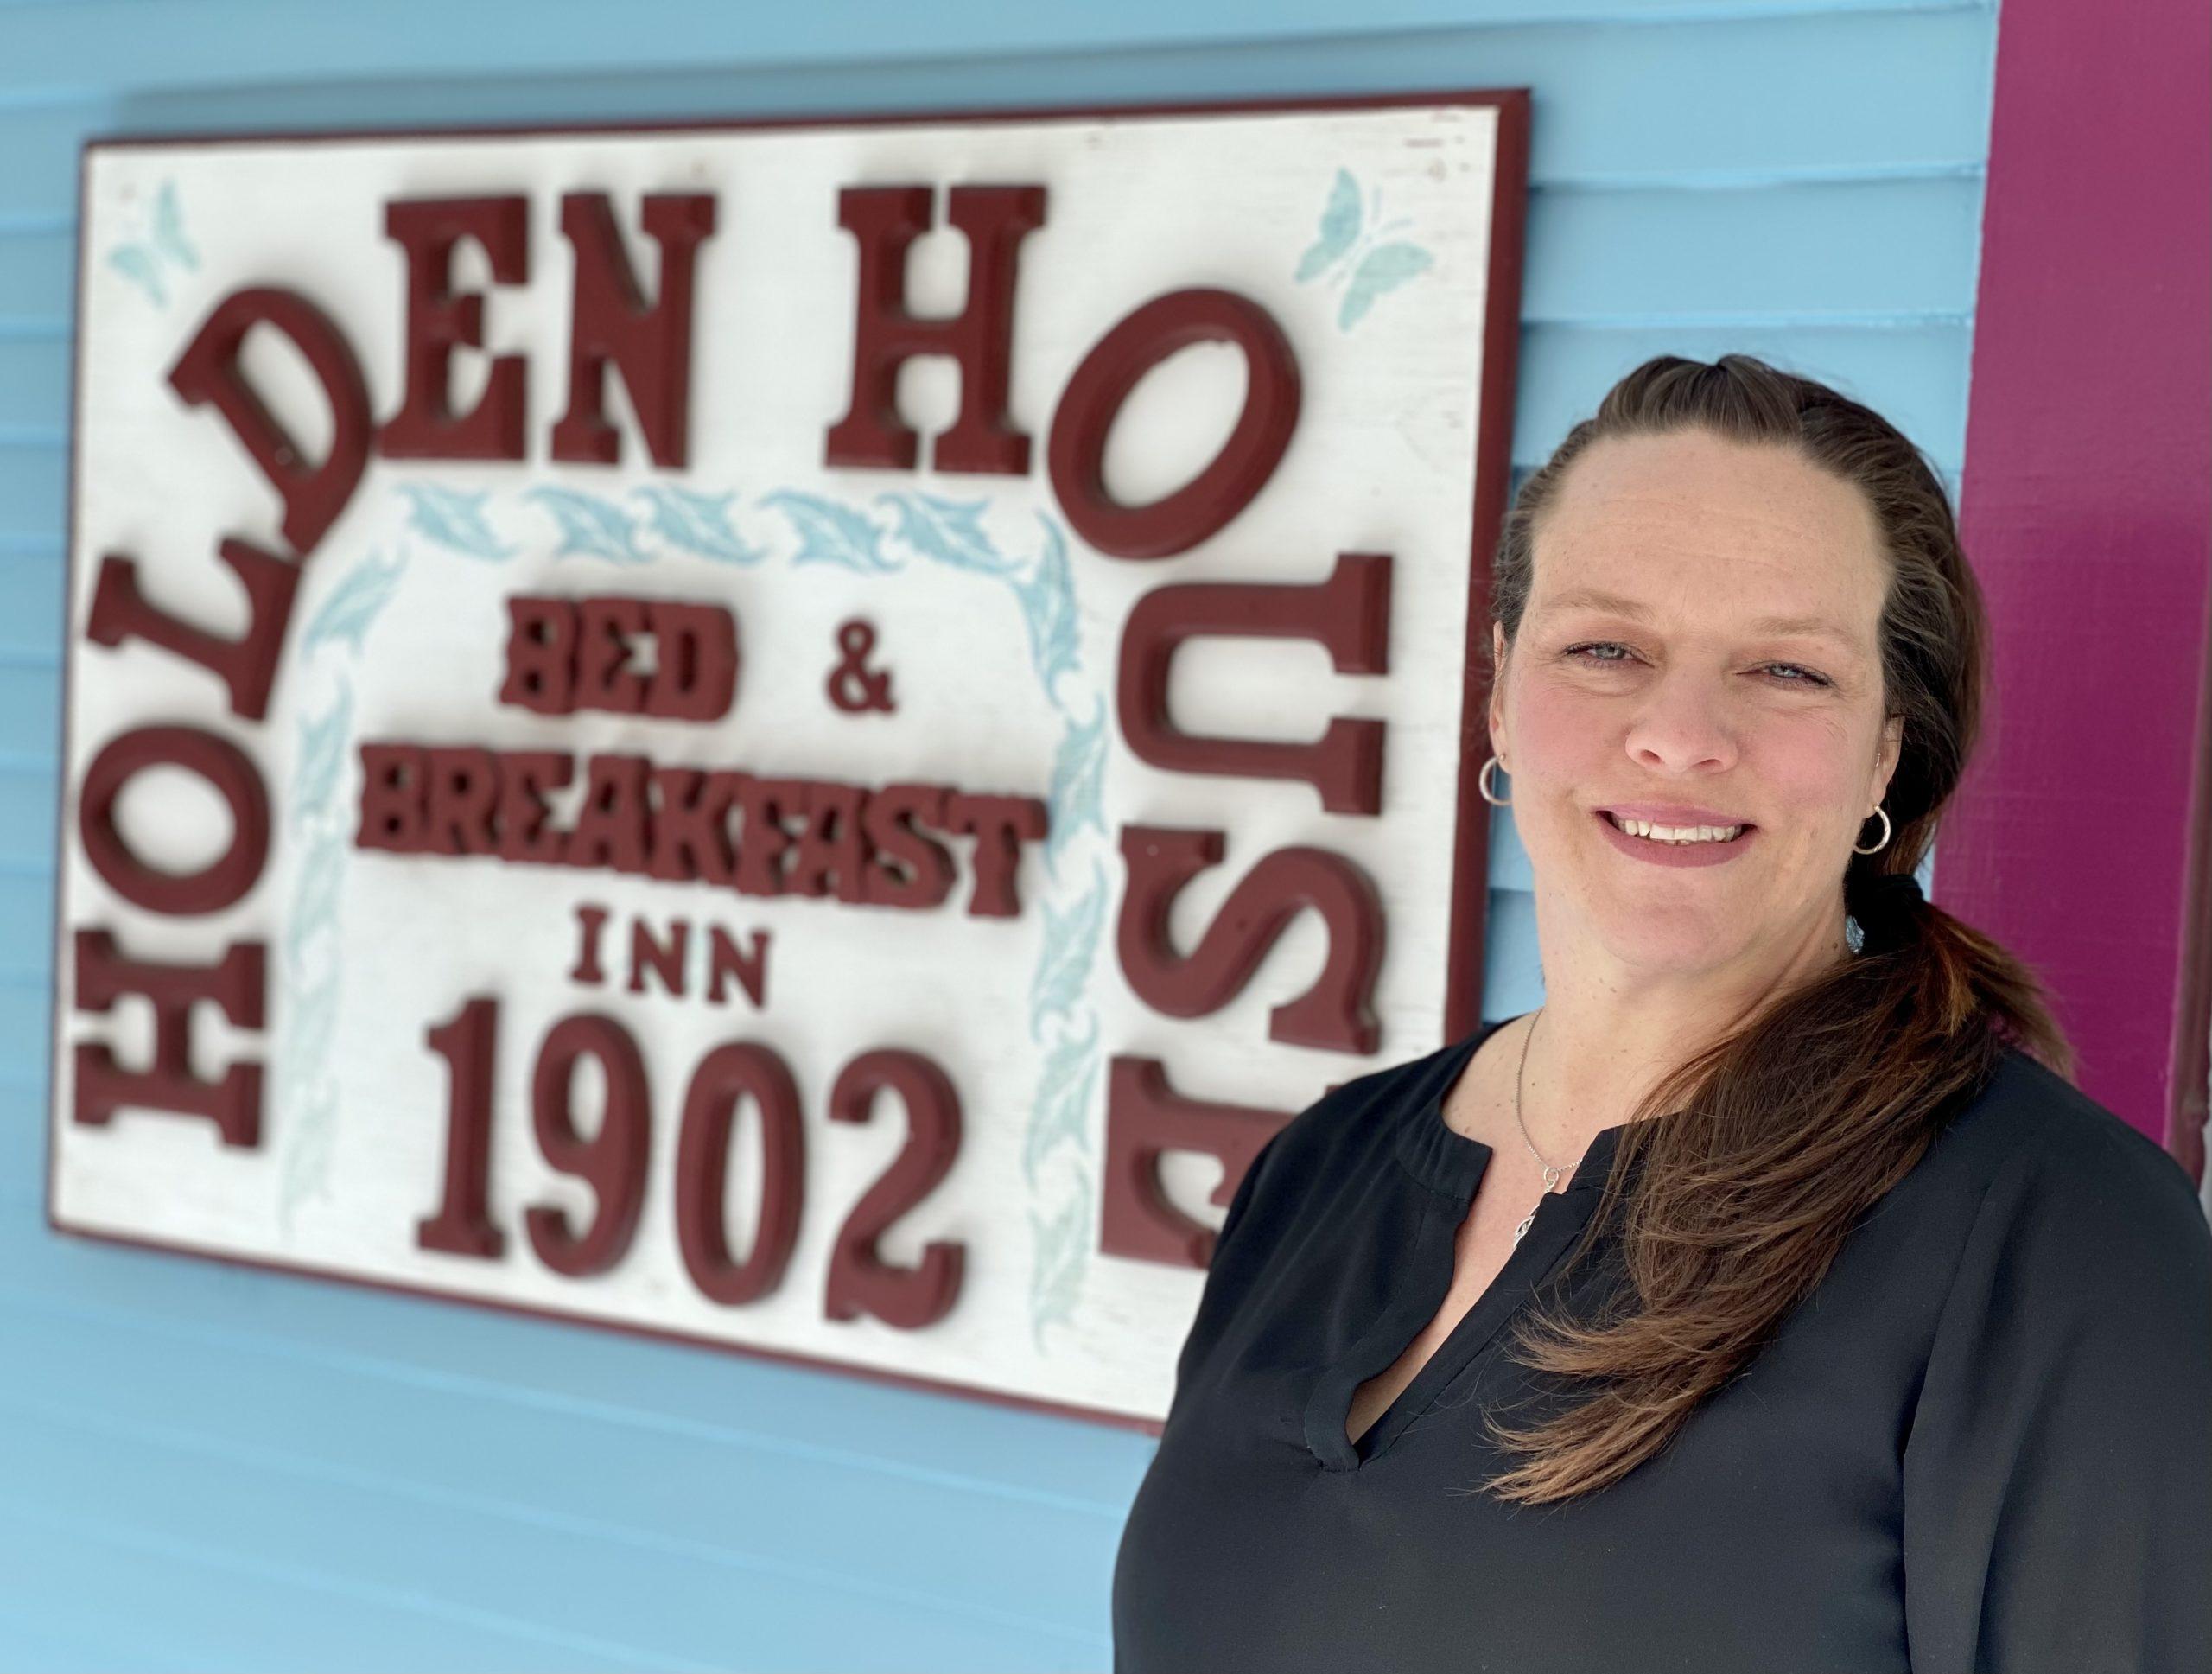 Heather Hidalgo Assistant Innkeeper